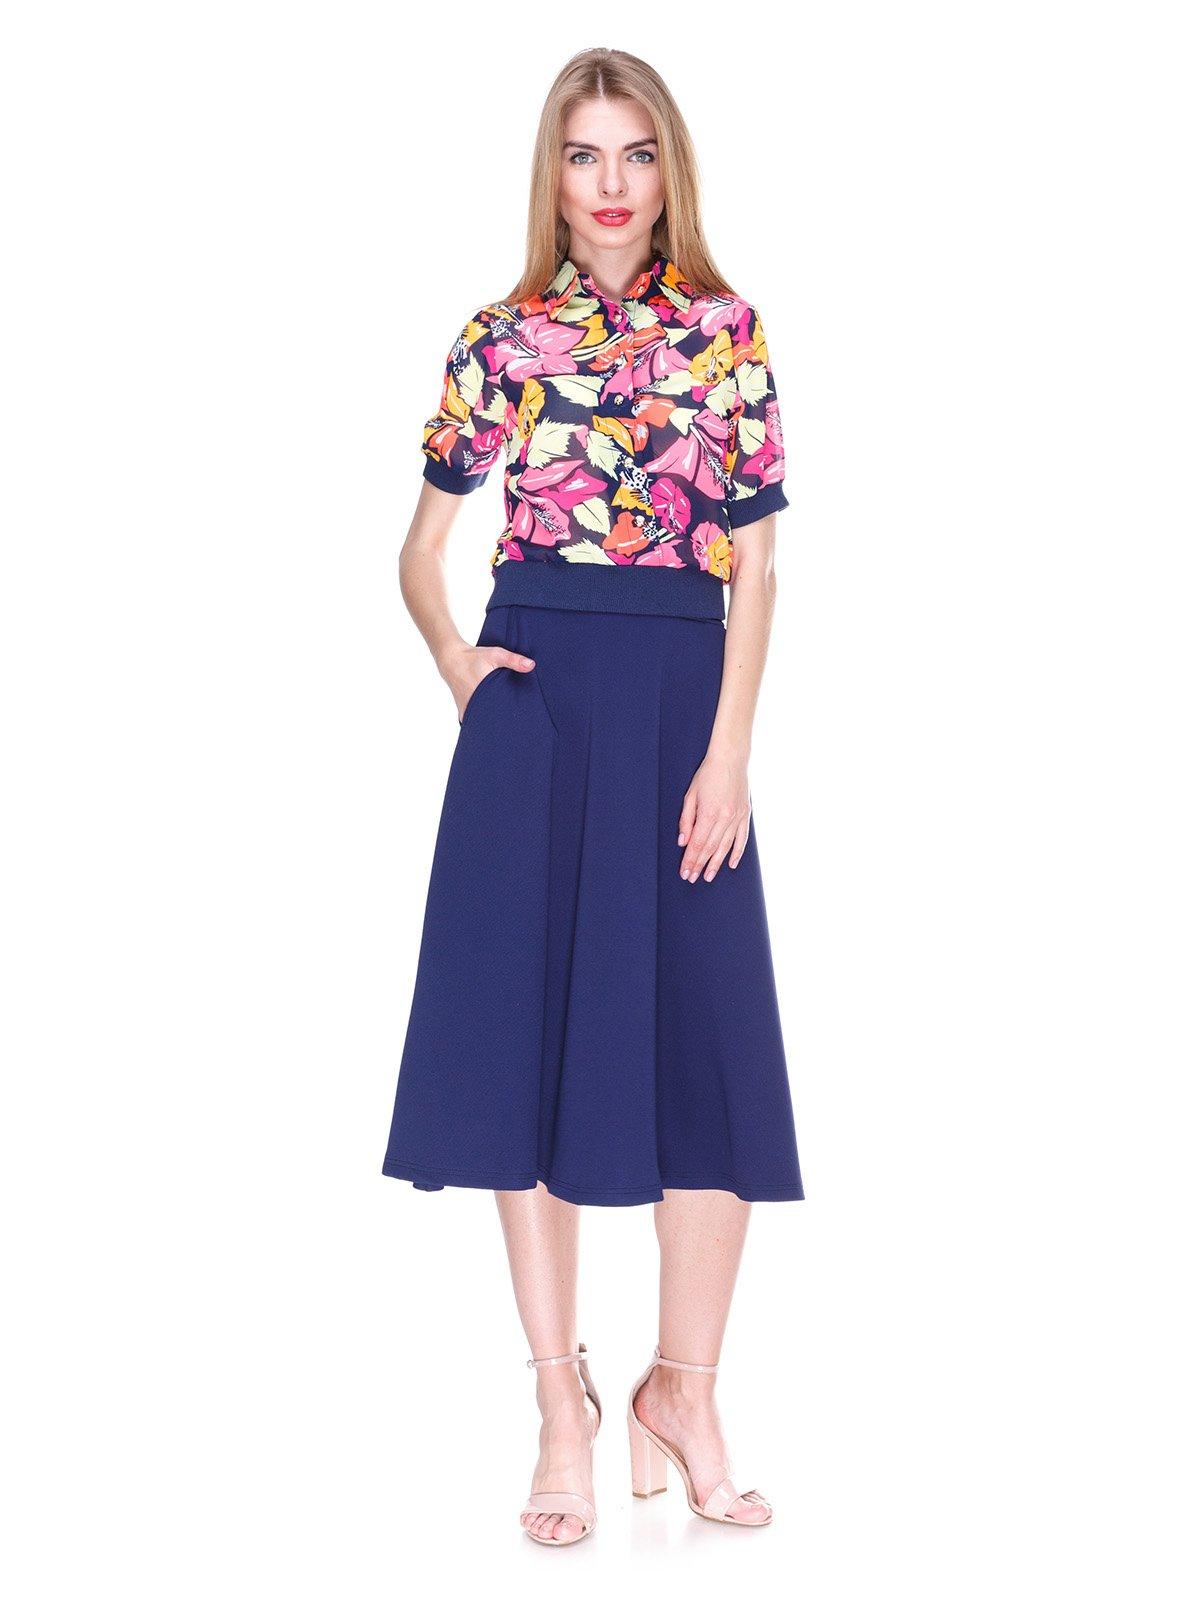 Блуза темно-синяя с цветочным принтом | 2273972 | фото 4